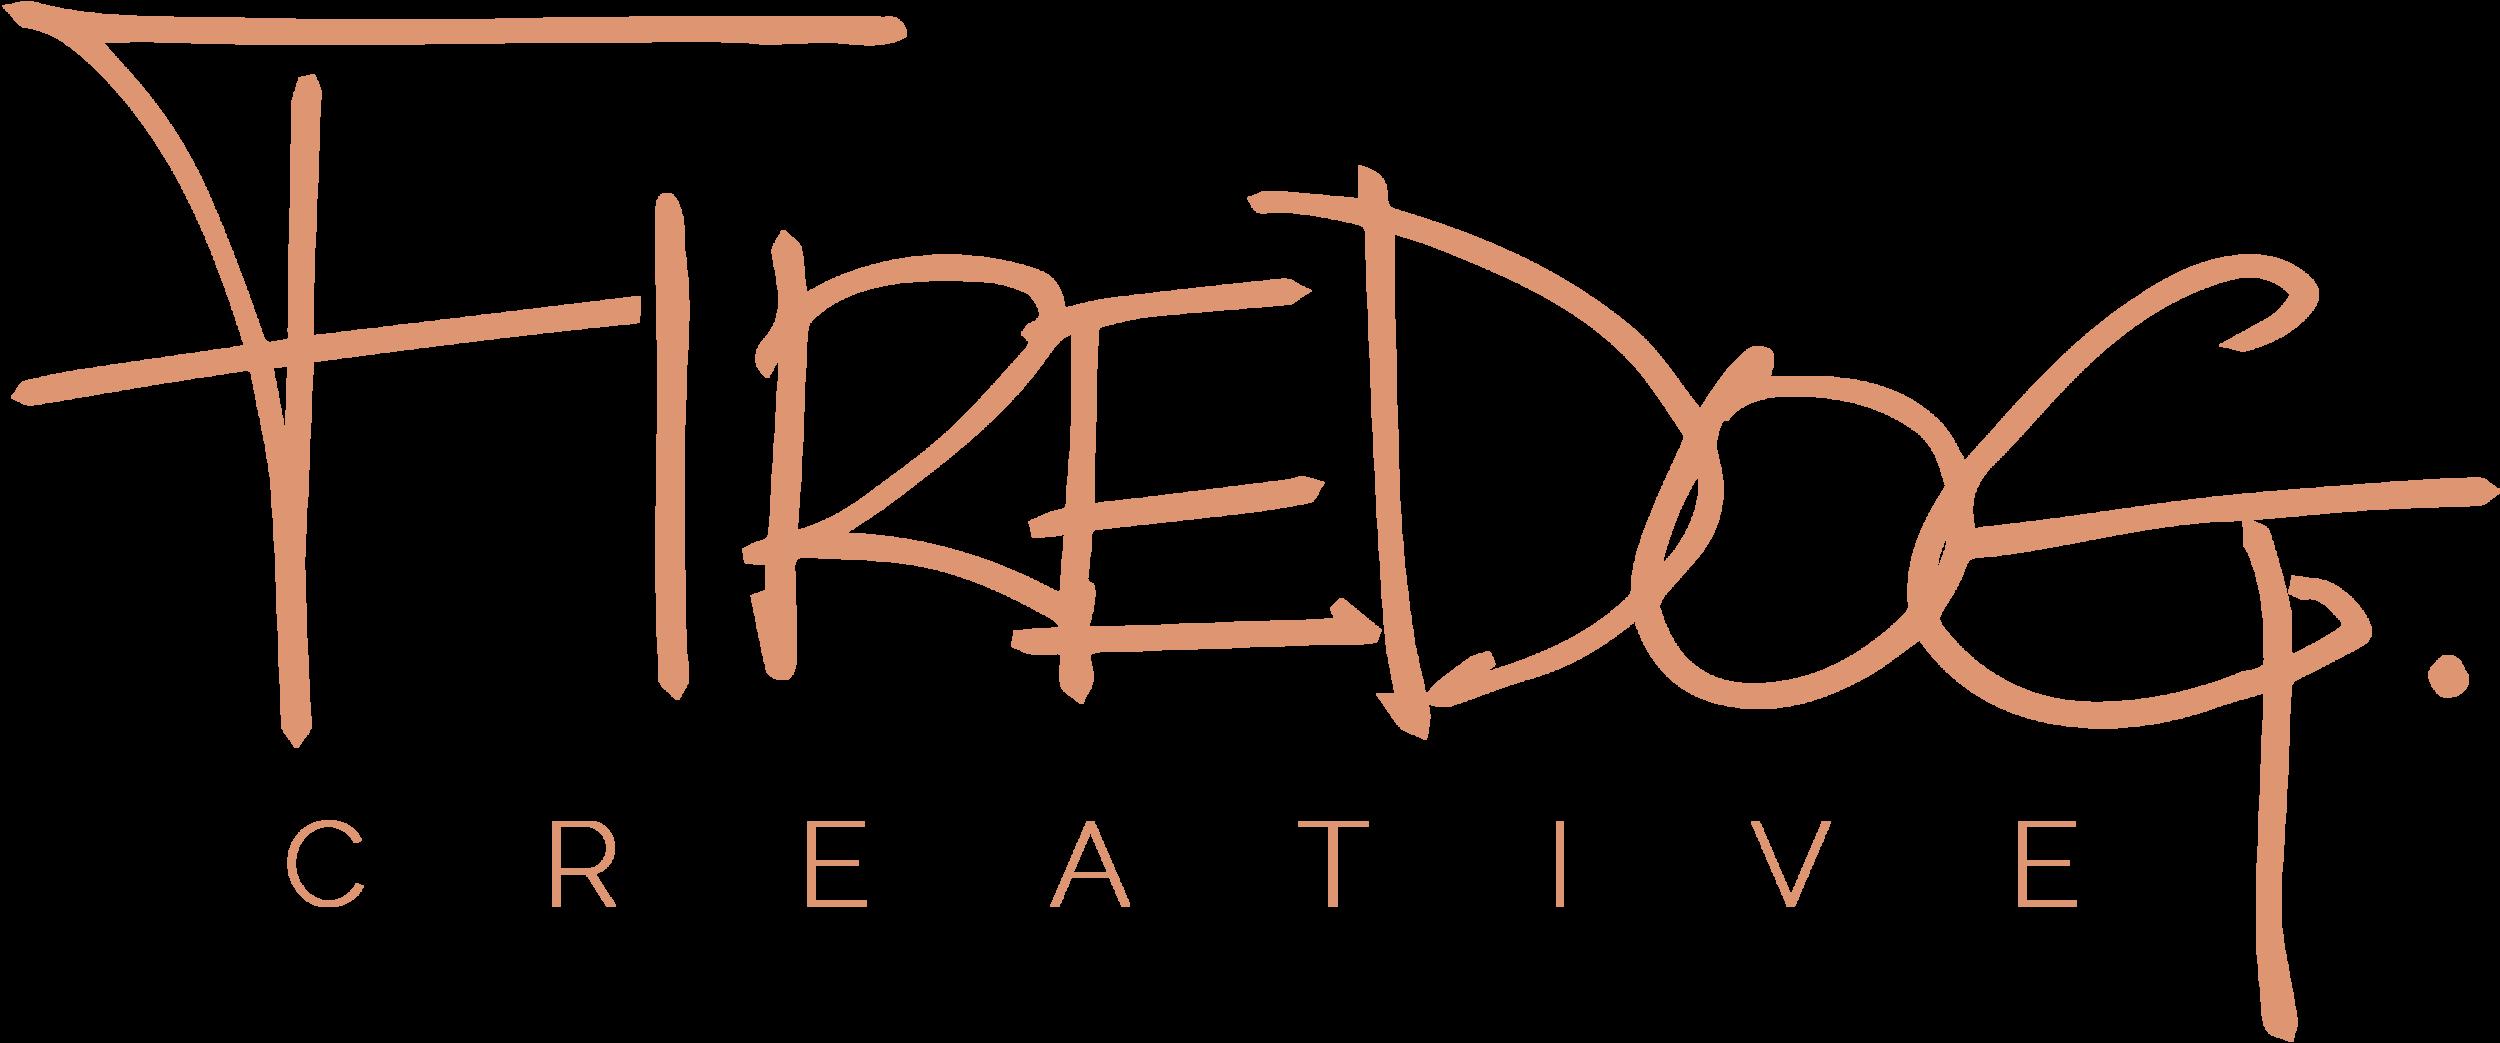 FireDog-Creative-Gold.png